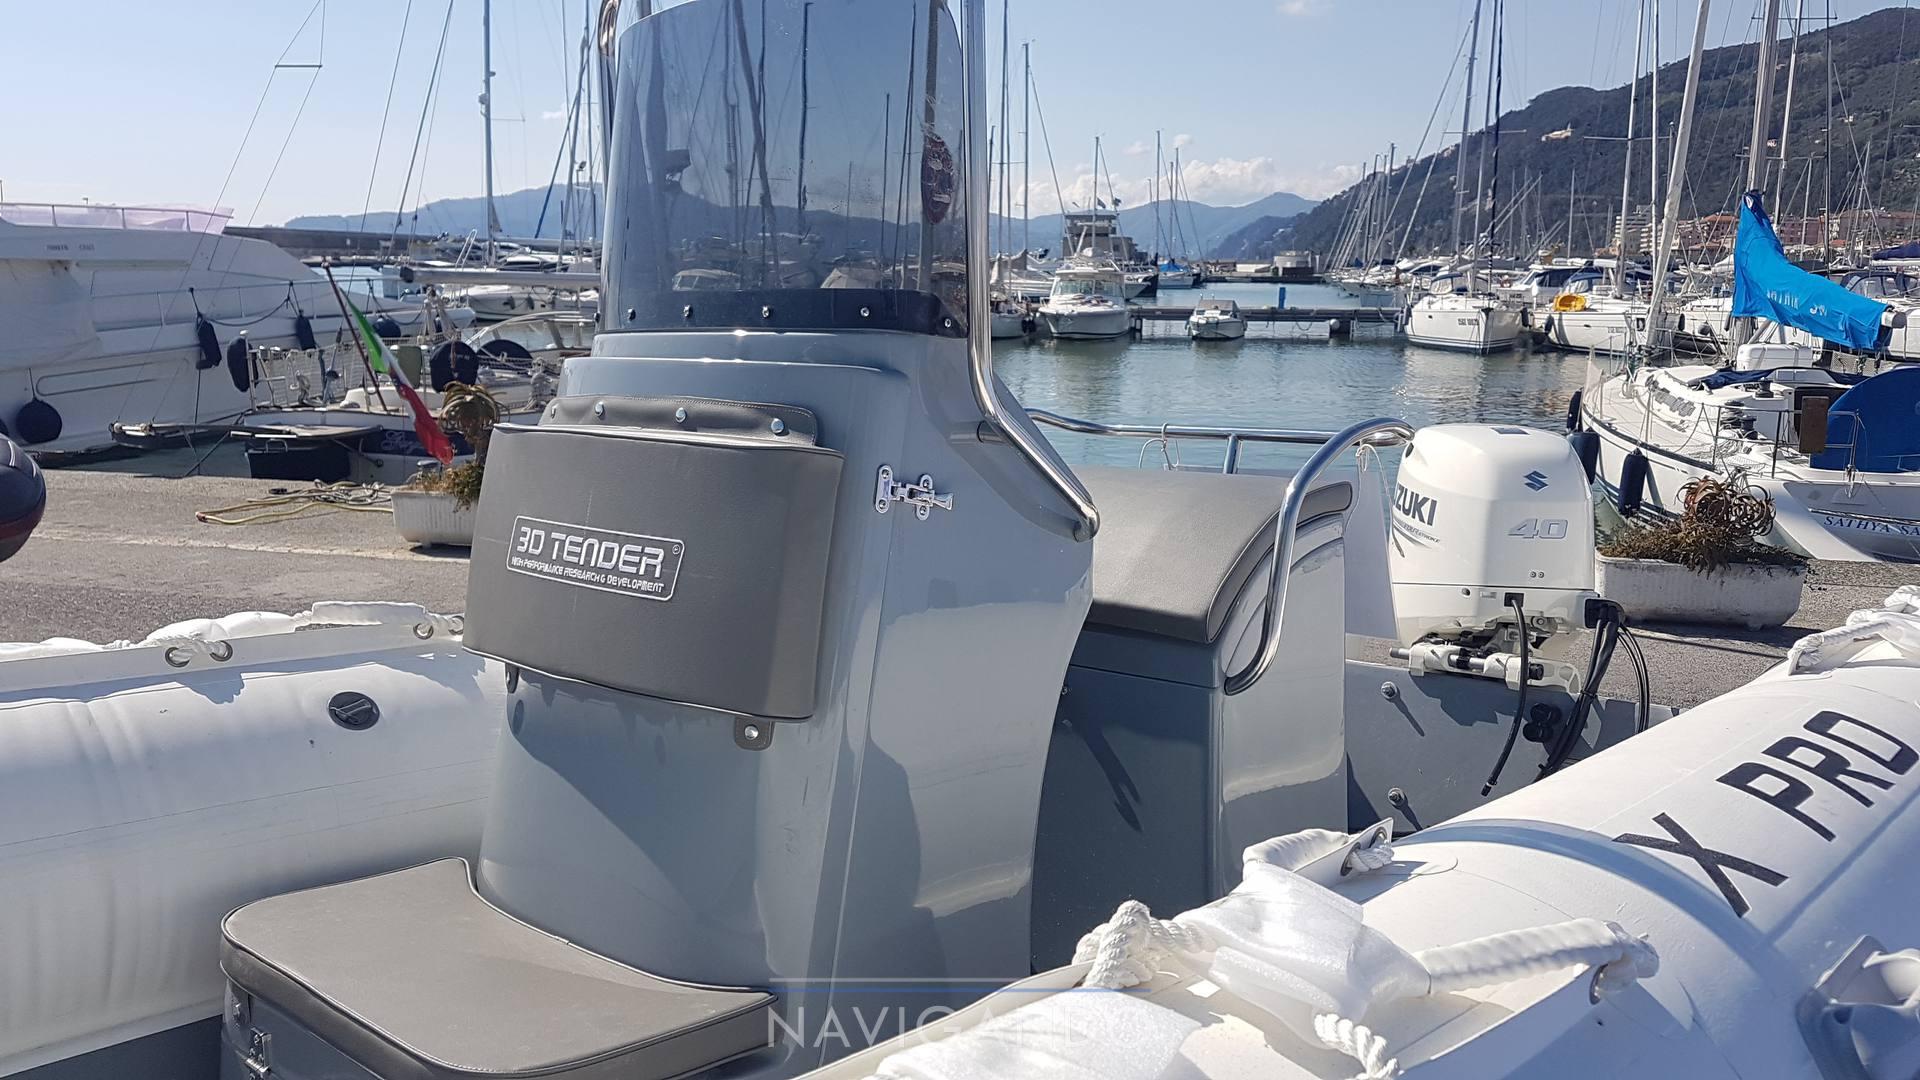 3d tender X pro 535 机动船 新发售